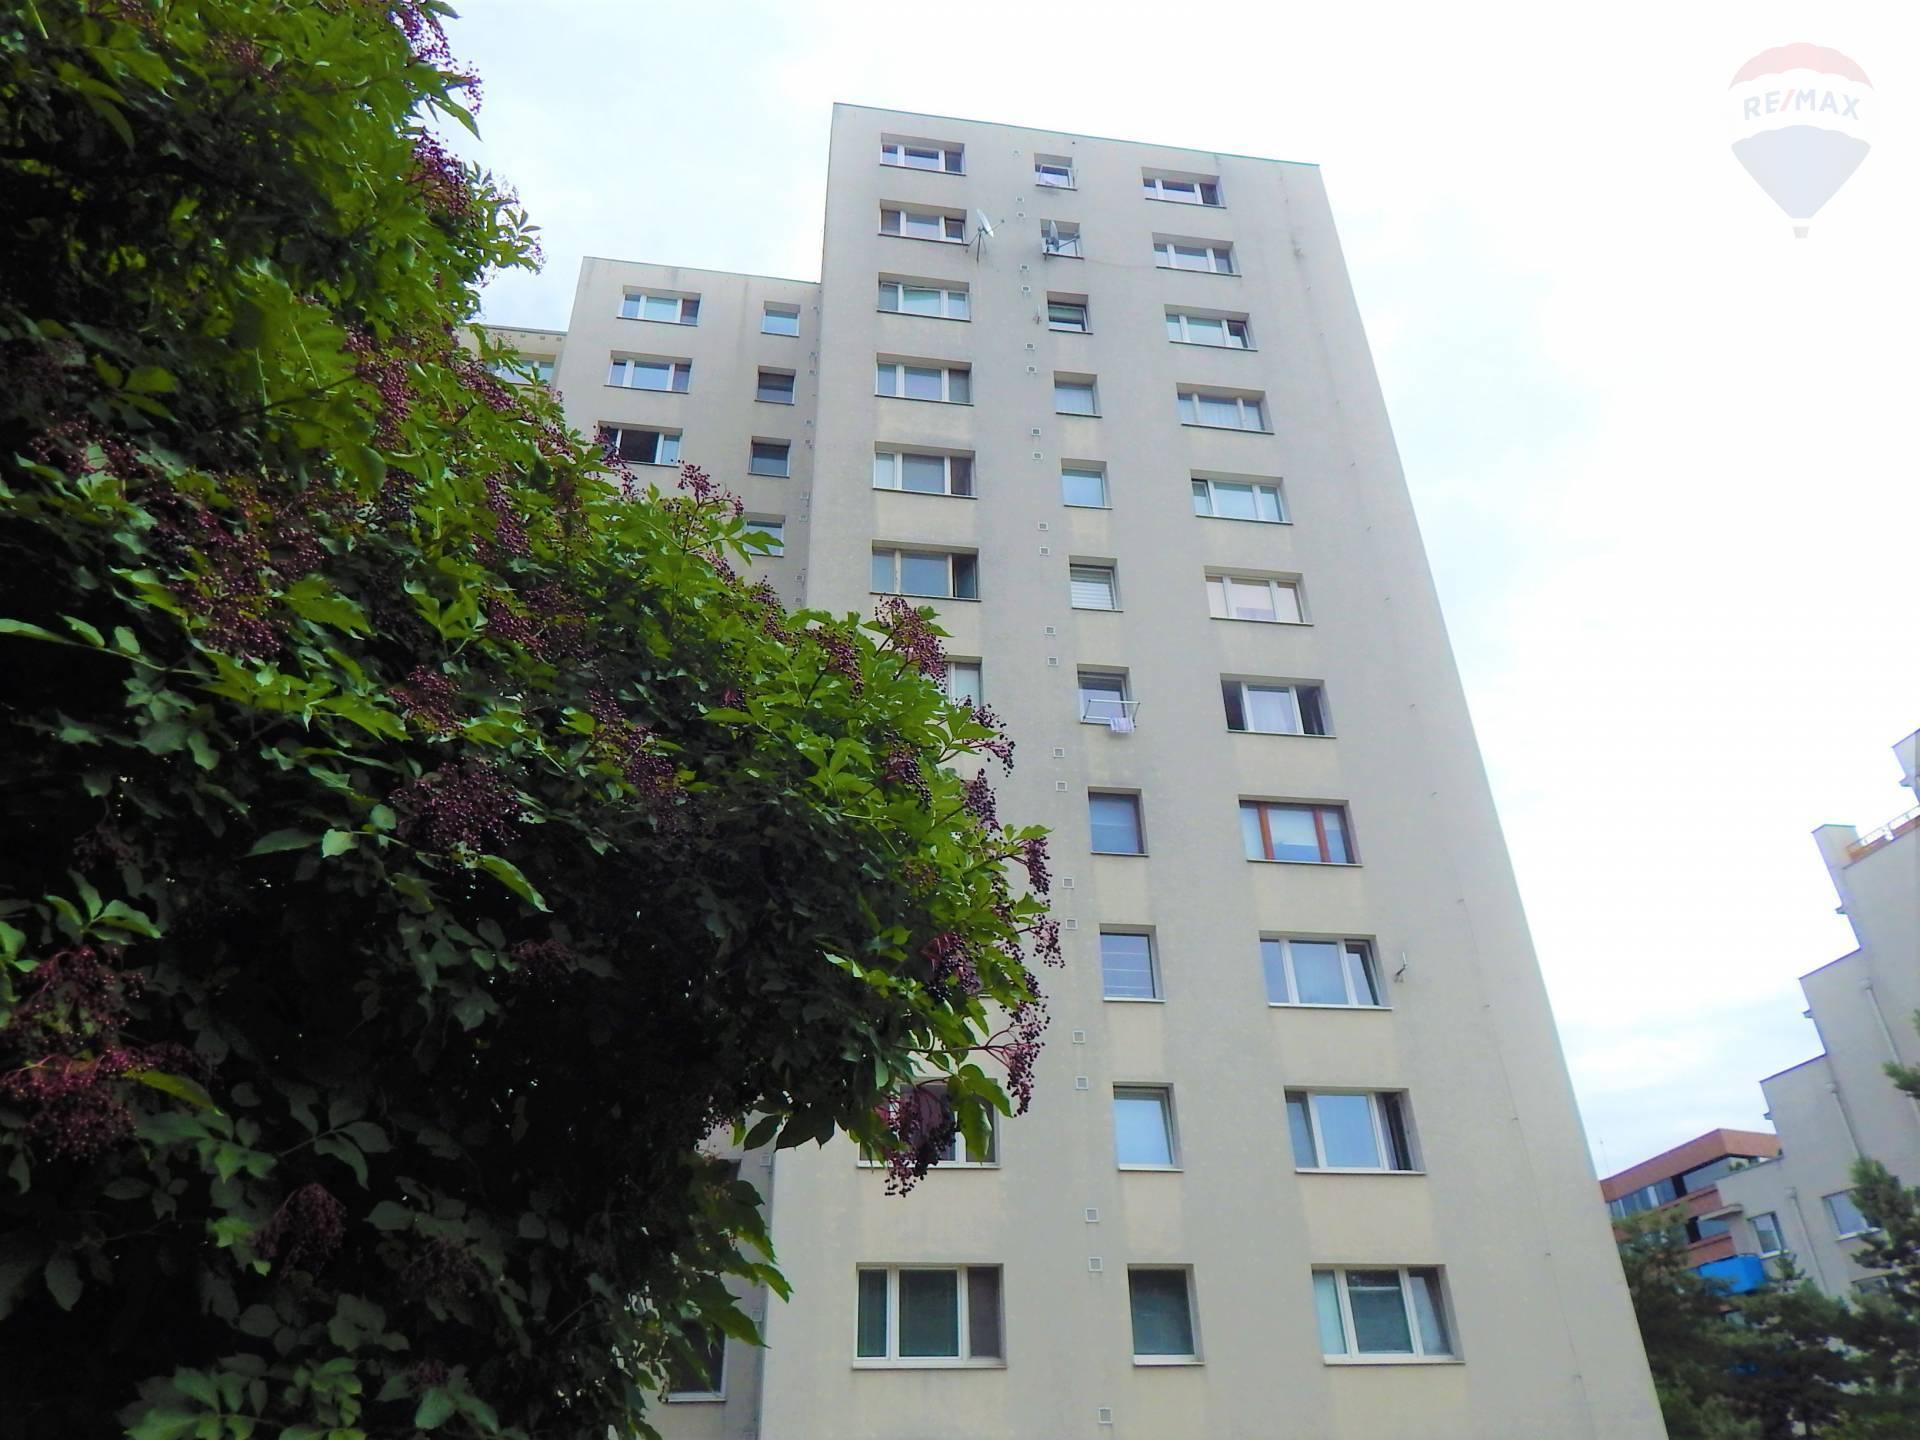 Predaj: 2,5i byt v Dúbravke na Saratovskej ulici v príjemnom, zelenom prostredí